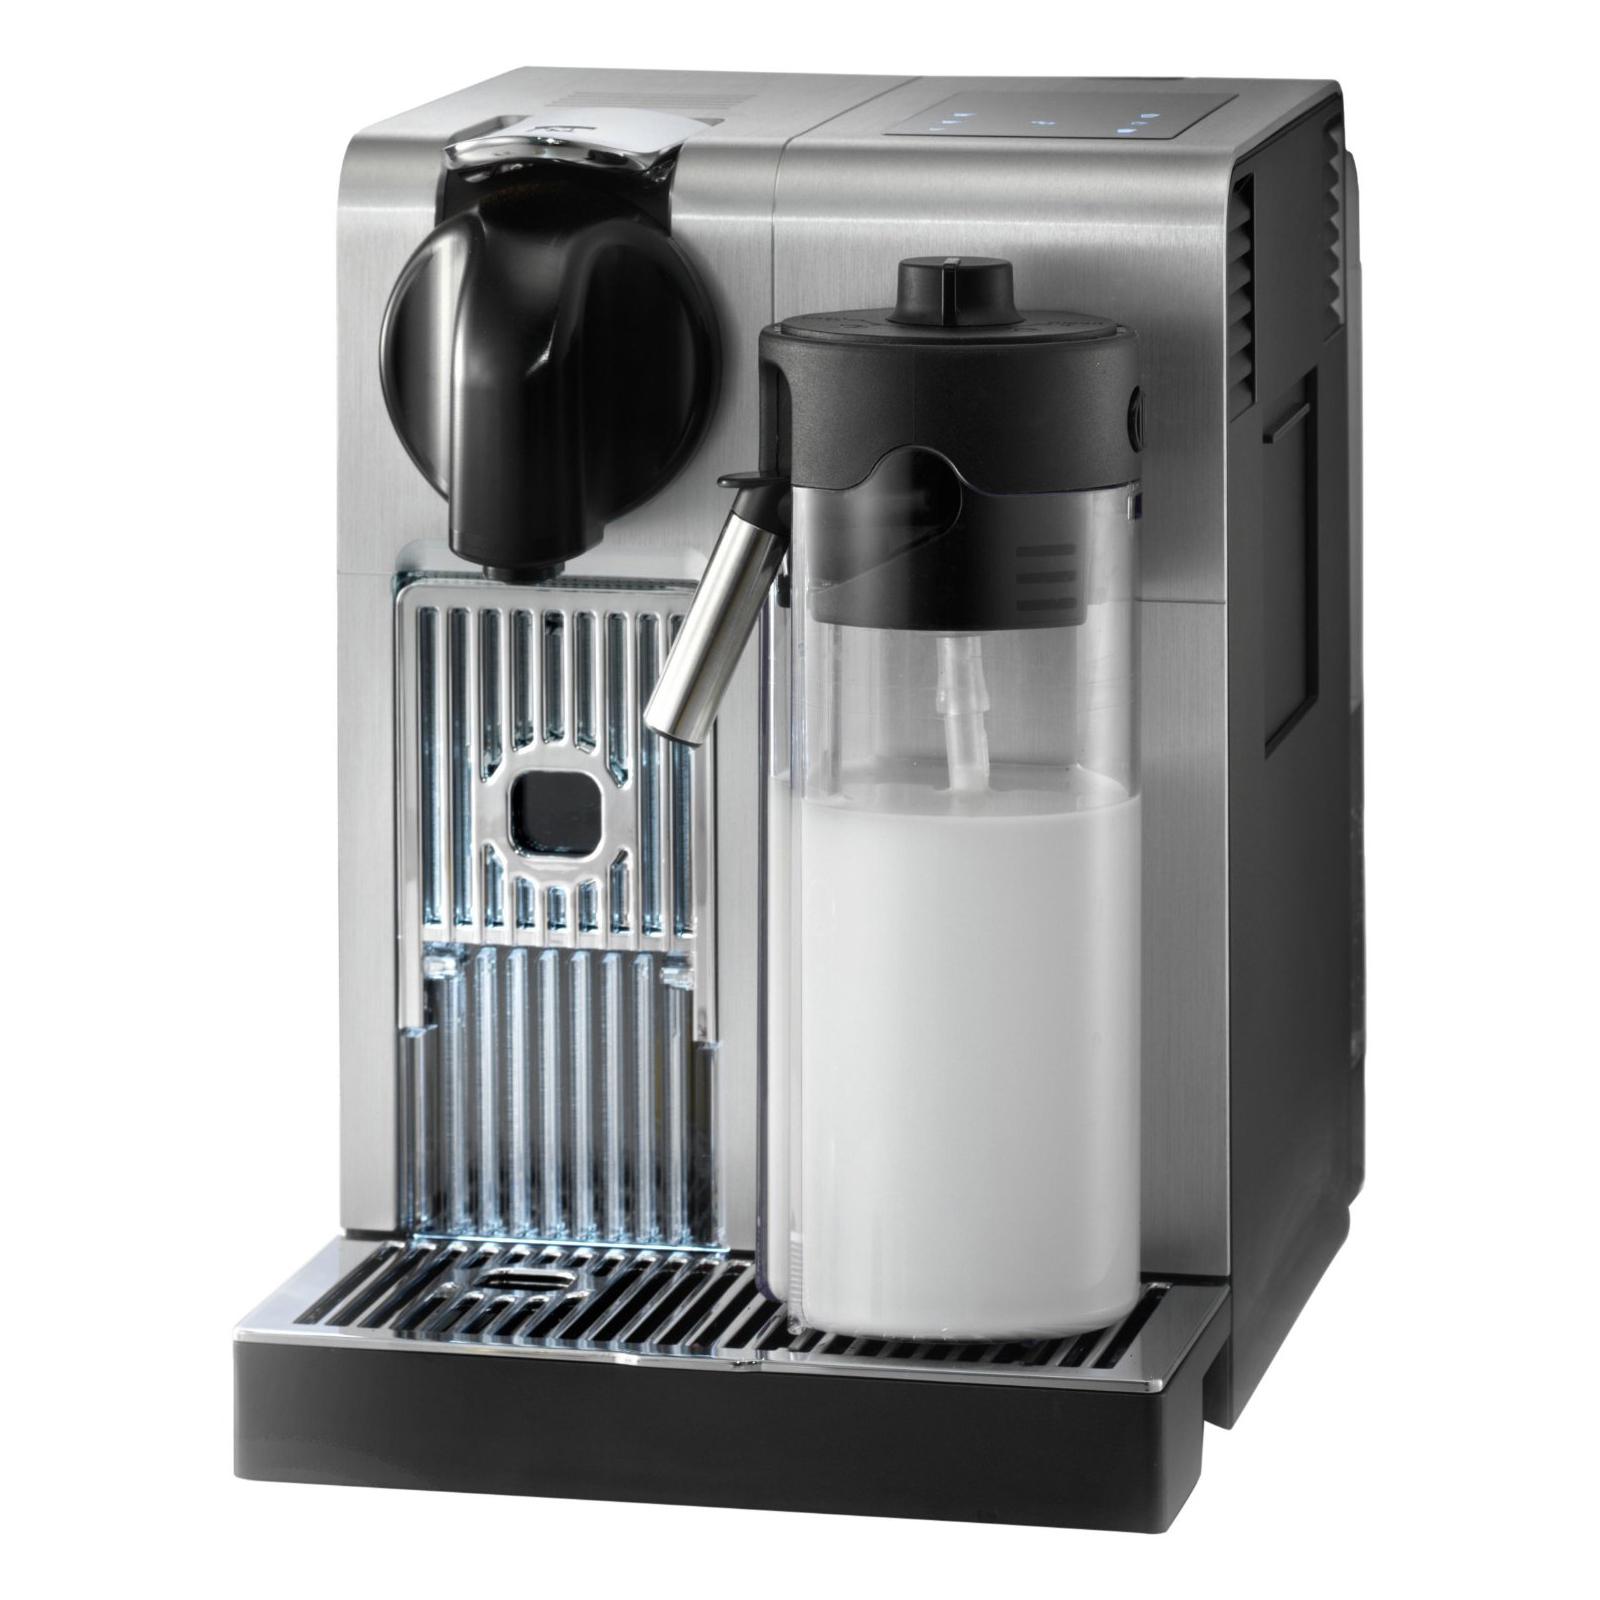 Keurig Rivo vs Nespresso Lattissima -> Nespresso Vs Keurig